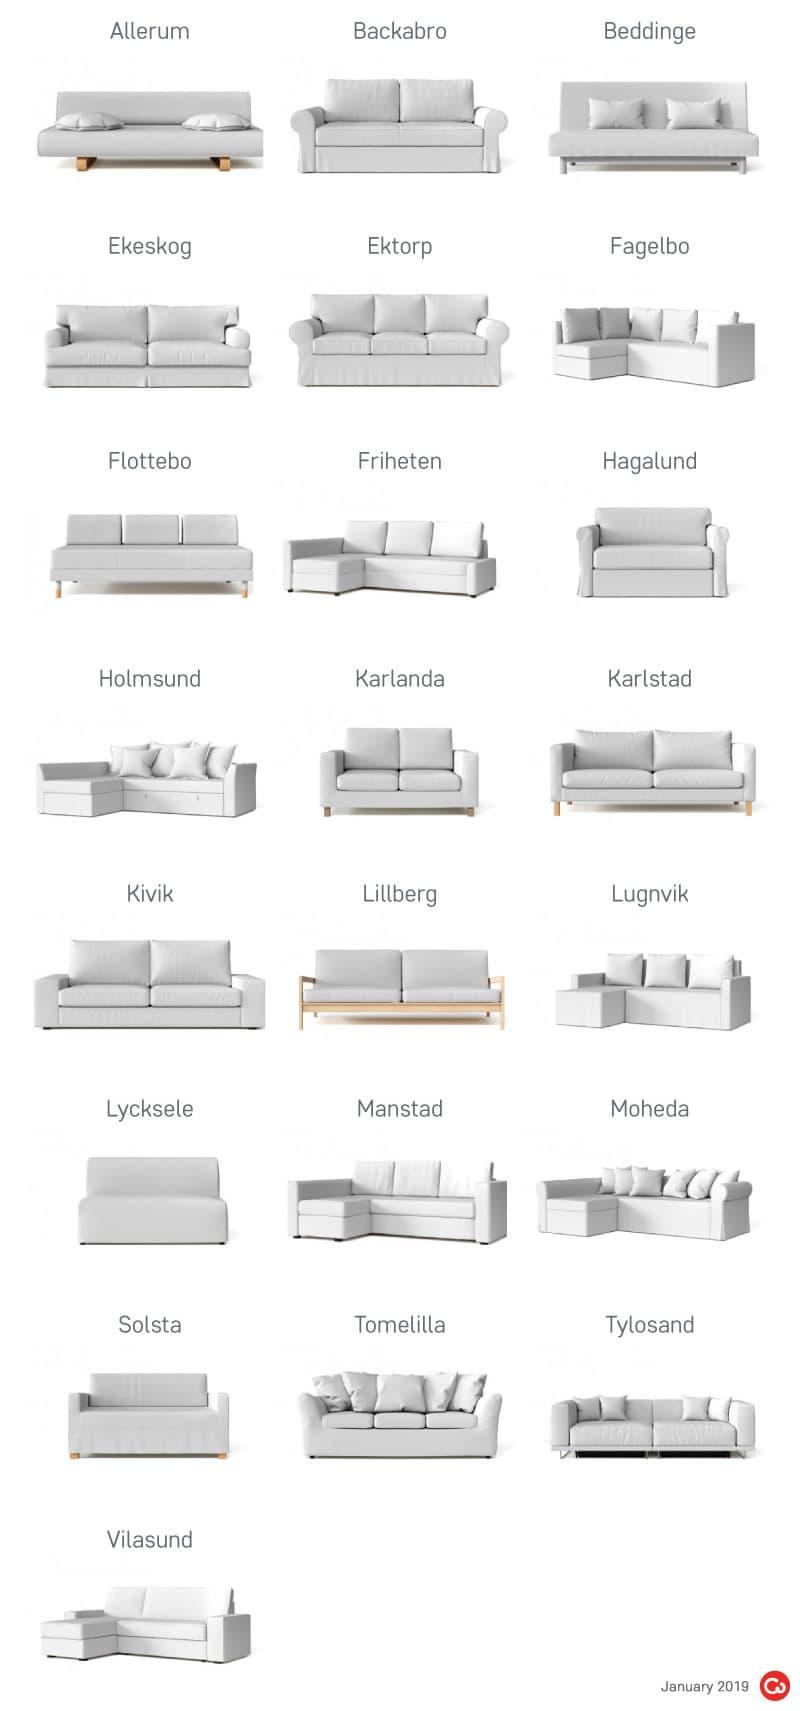 IKEA Discontinued Sofa Beds